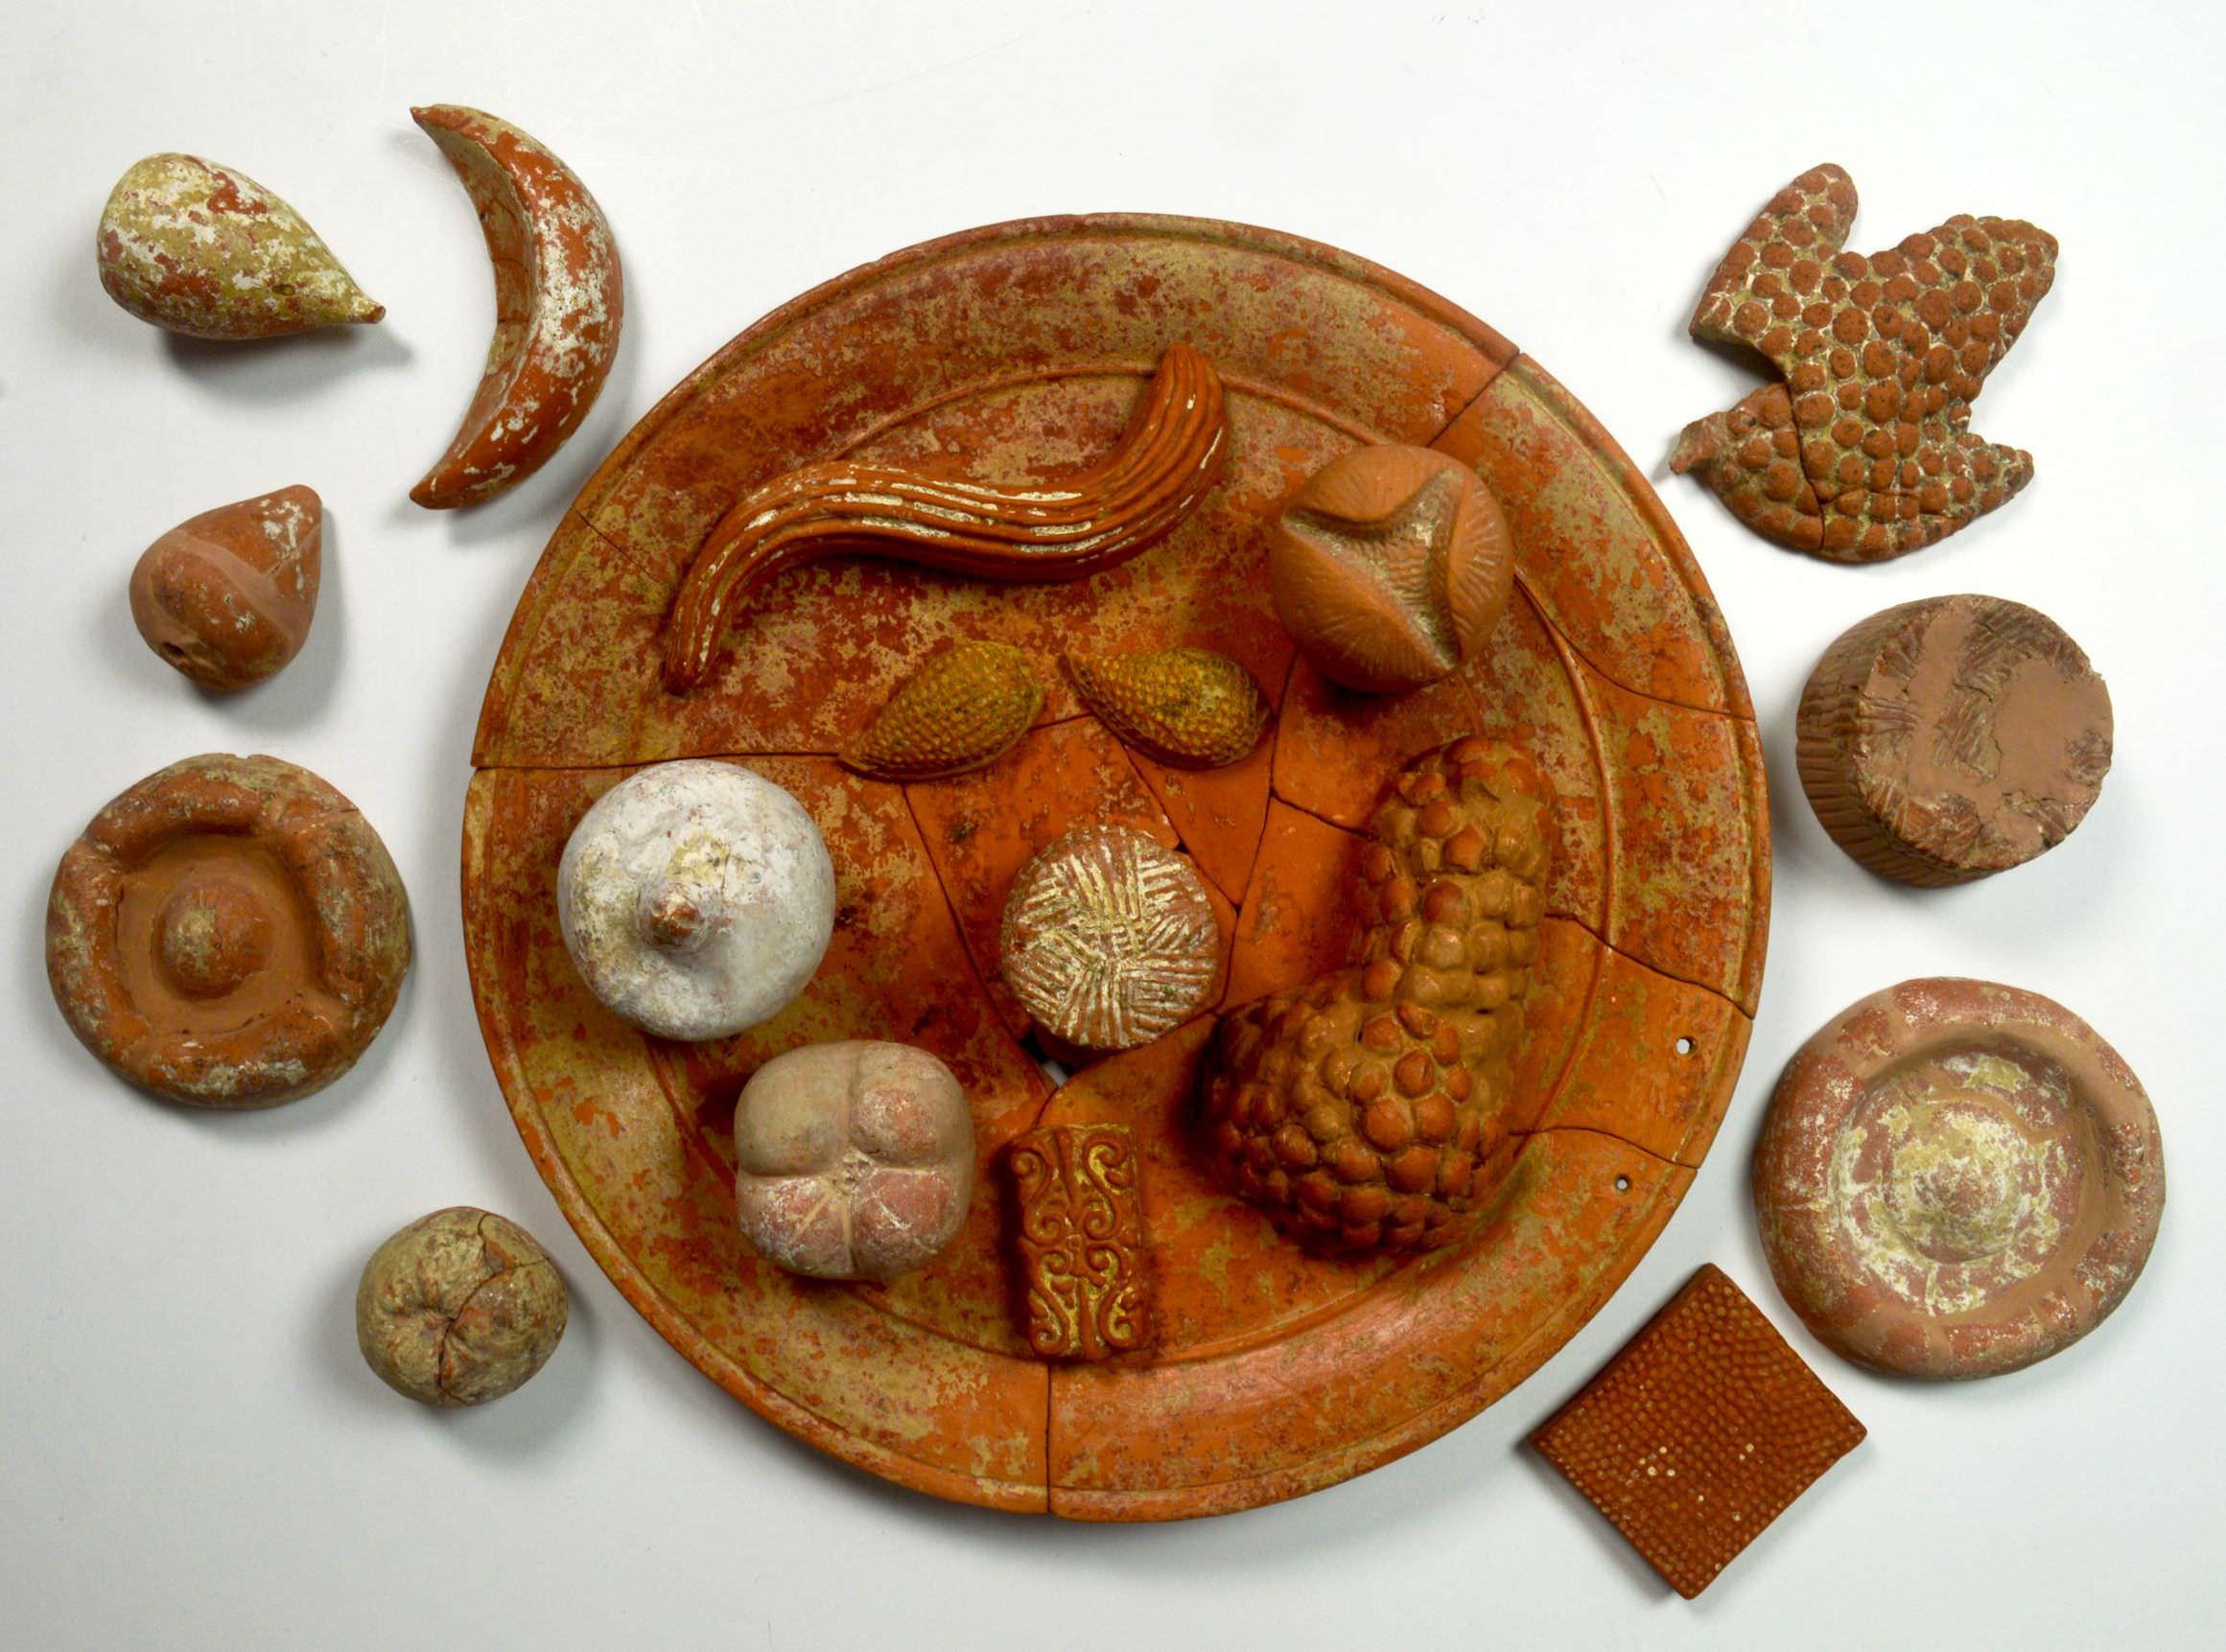 Terracotta votive food: pomegranates (open and closed); grapes; figs; almonds; cheeses; focaccia; honeycomb; mold; long bread, 360 BC. Tomb 11, Contrada Vecchia, Agropoli. Parco Archeologico Di Paestum